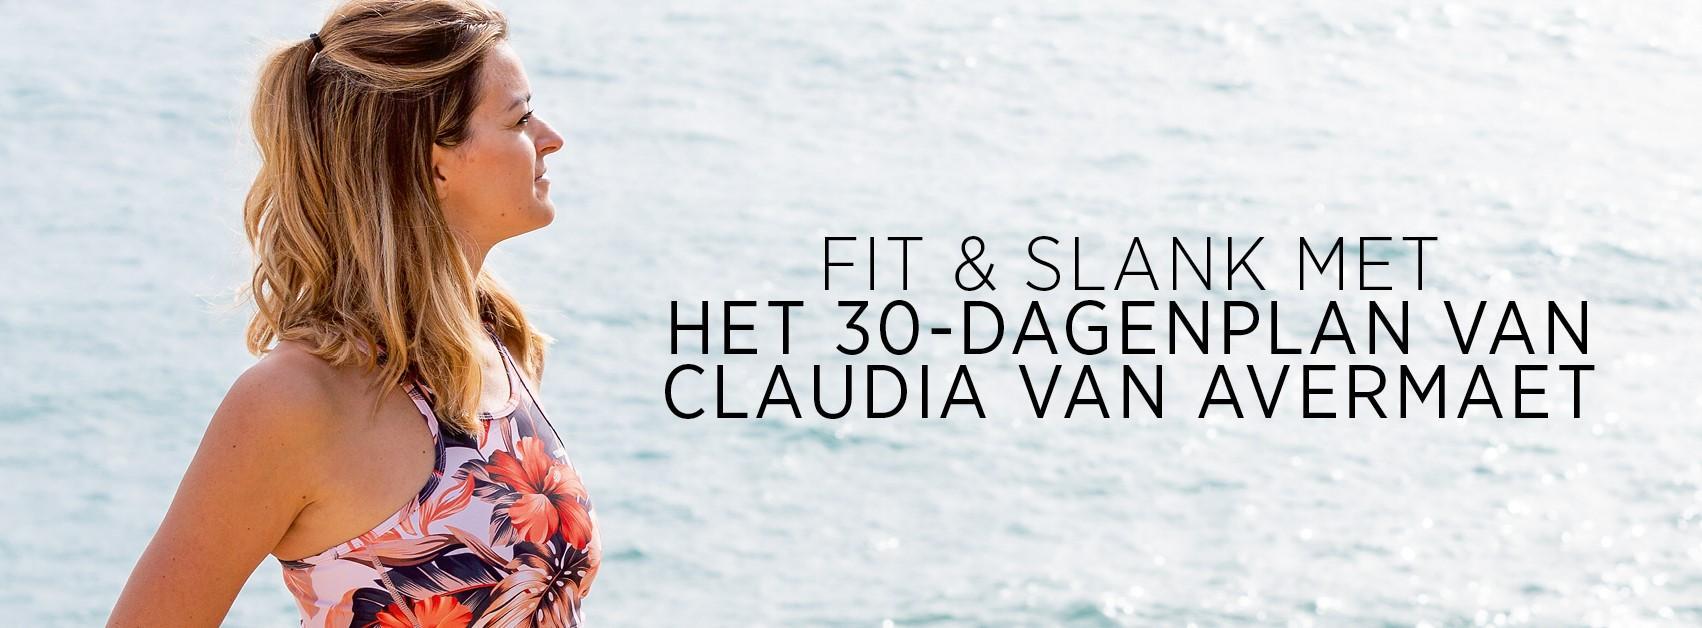 fit en slank 30 dagenplan Claudia Van Avermaet